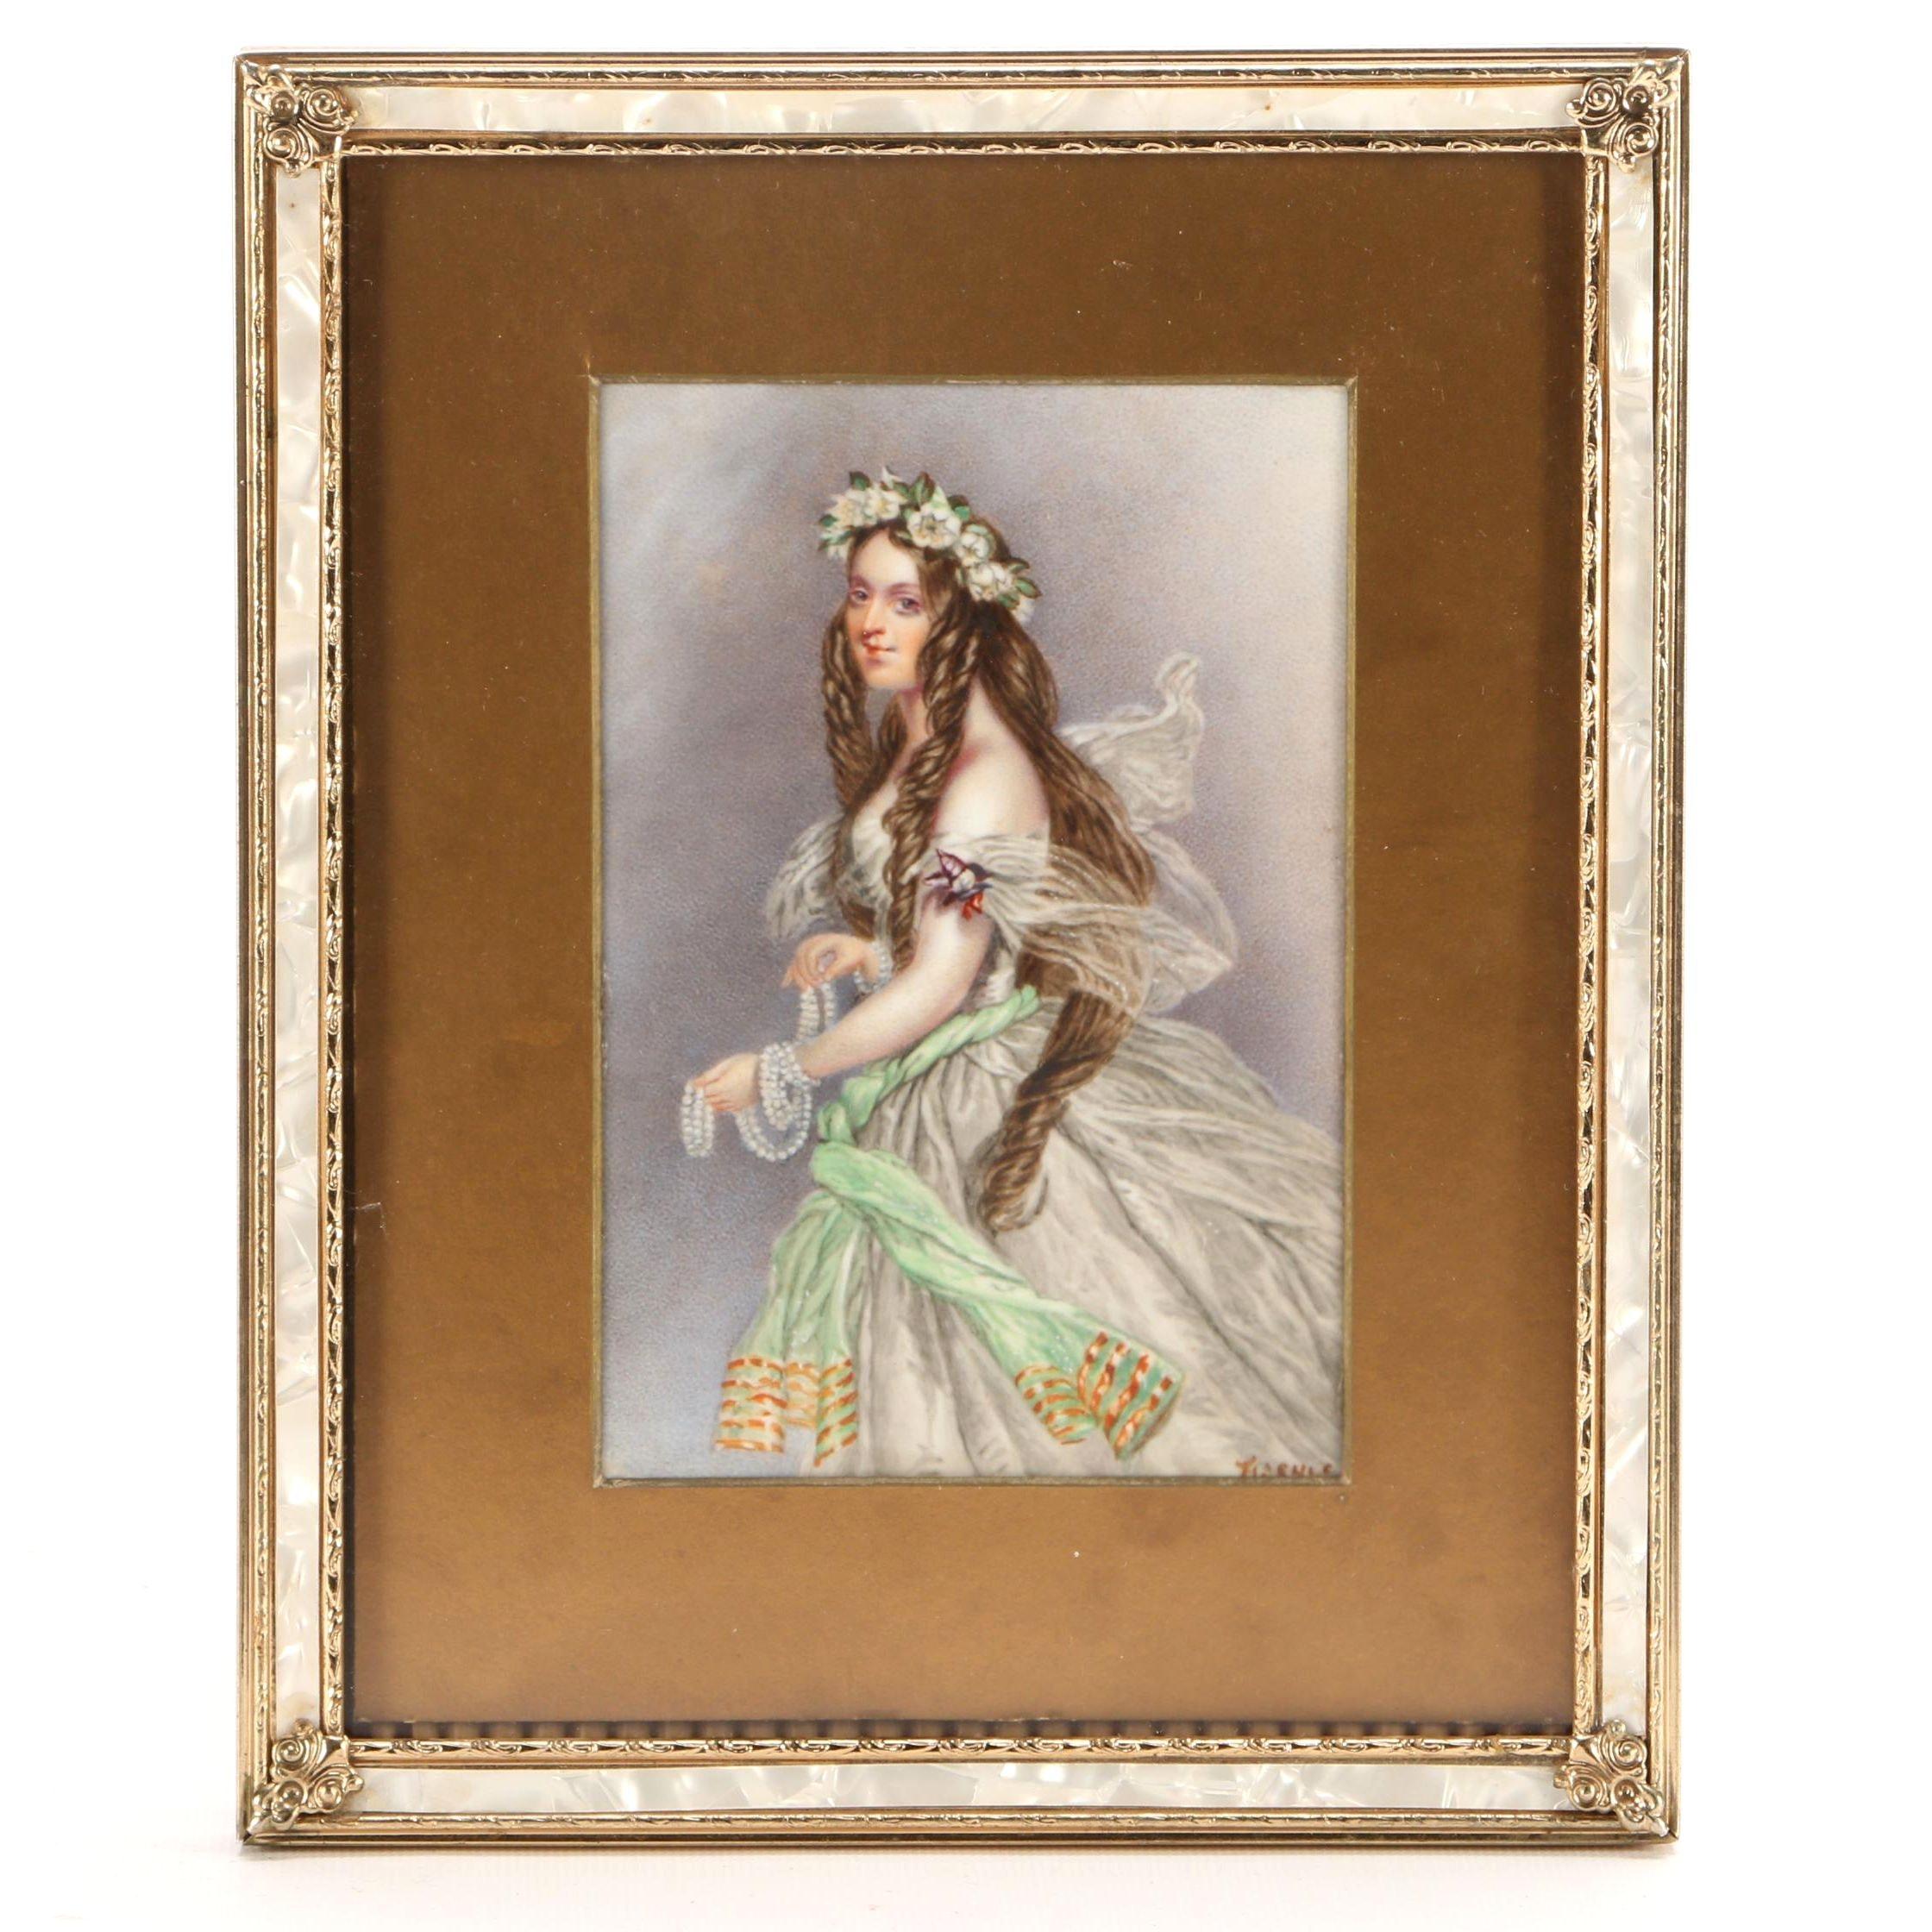 Hand-Painted Glazed Porcelain Portrait of Woman